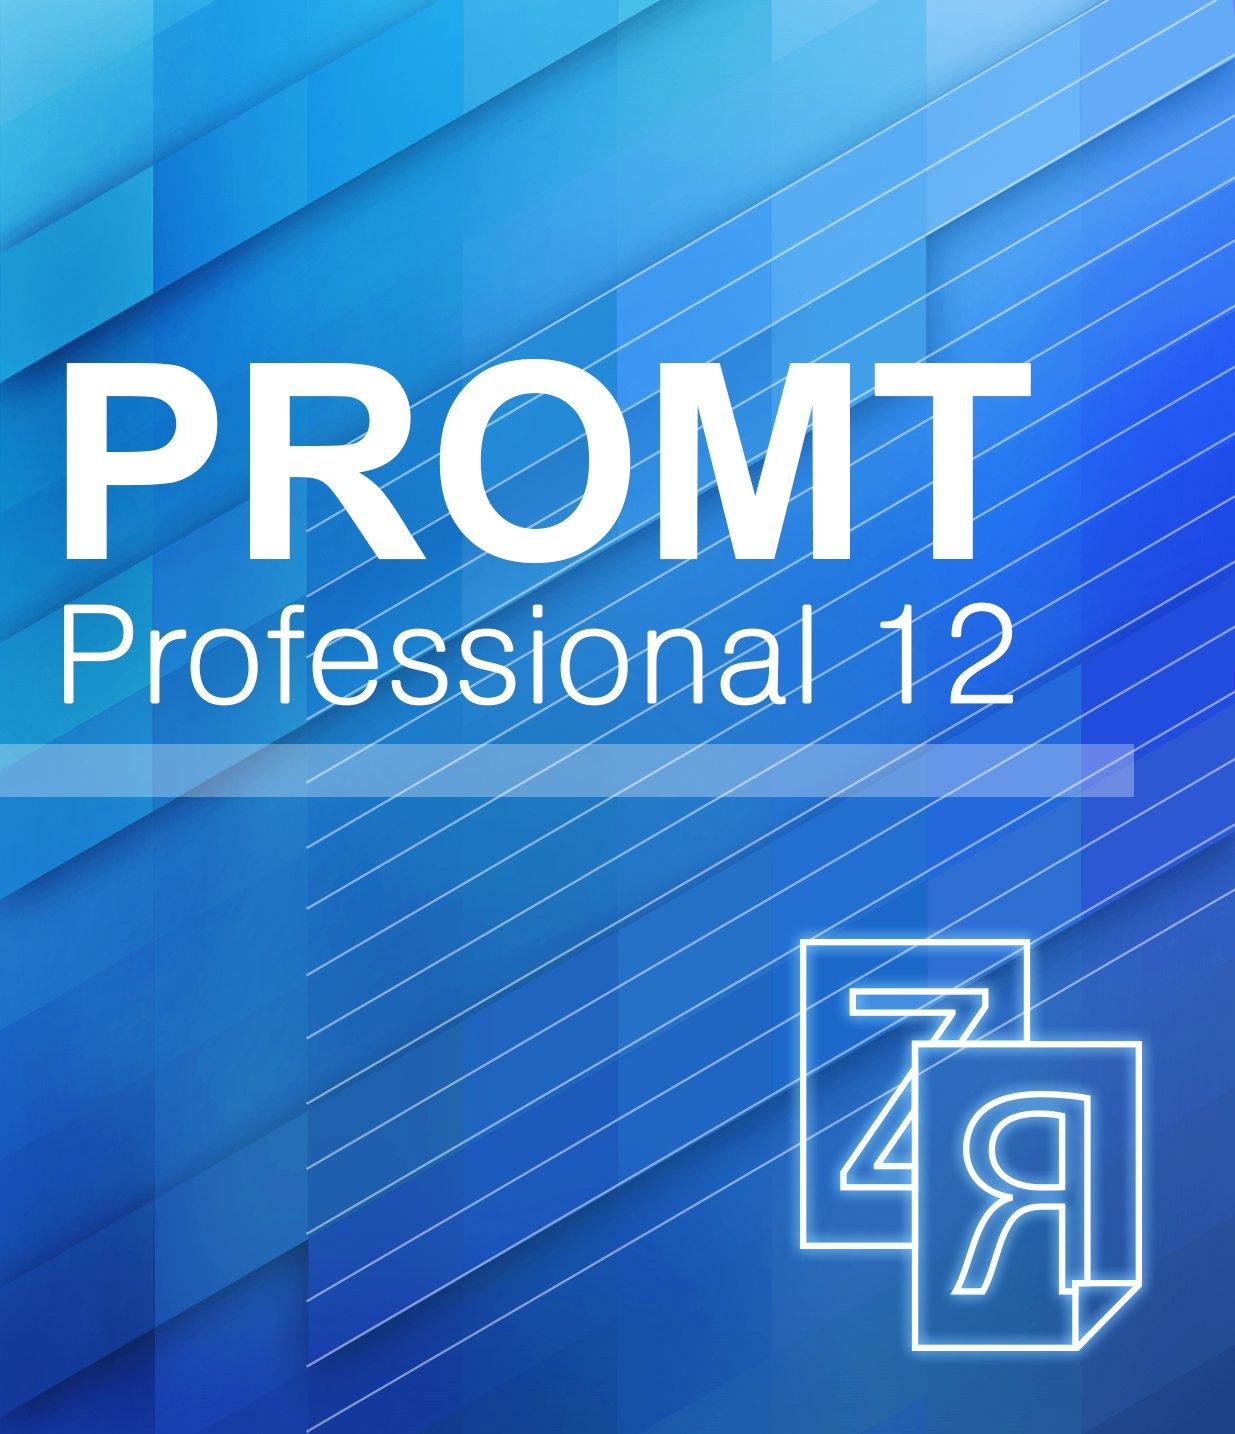 Promt professional 12 build 12. 0. 20 торрент.